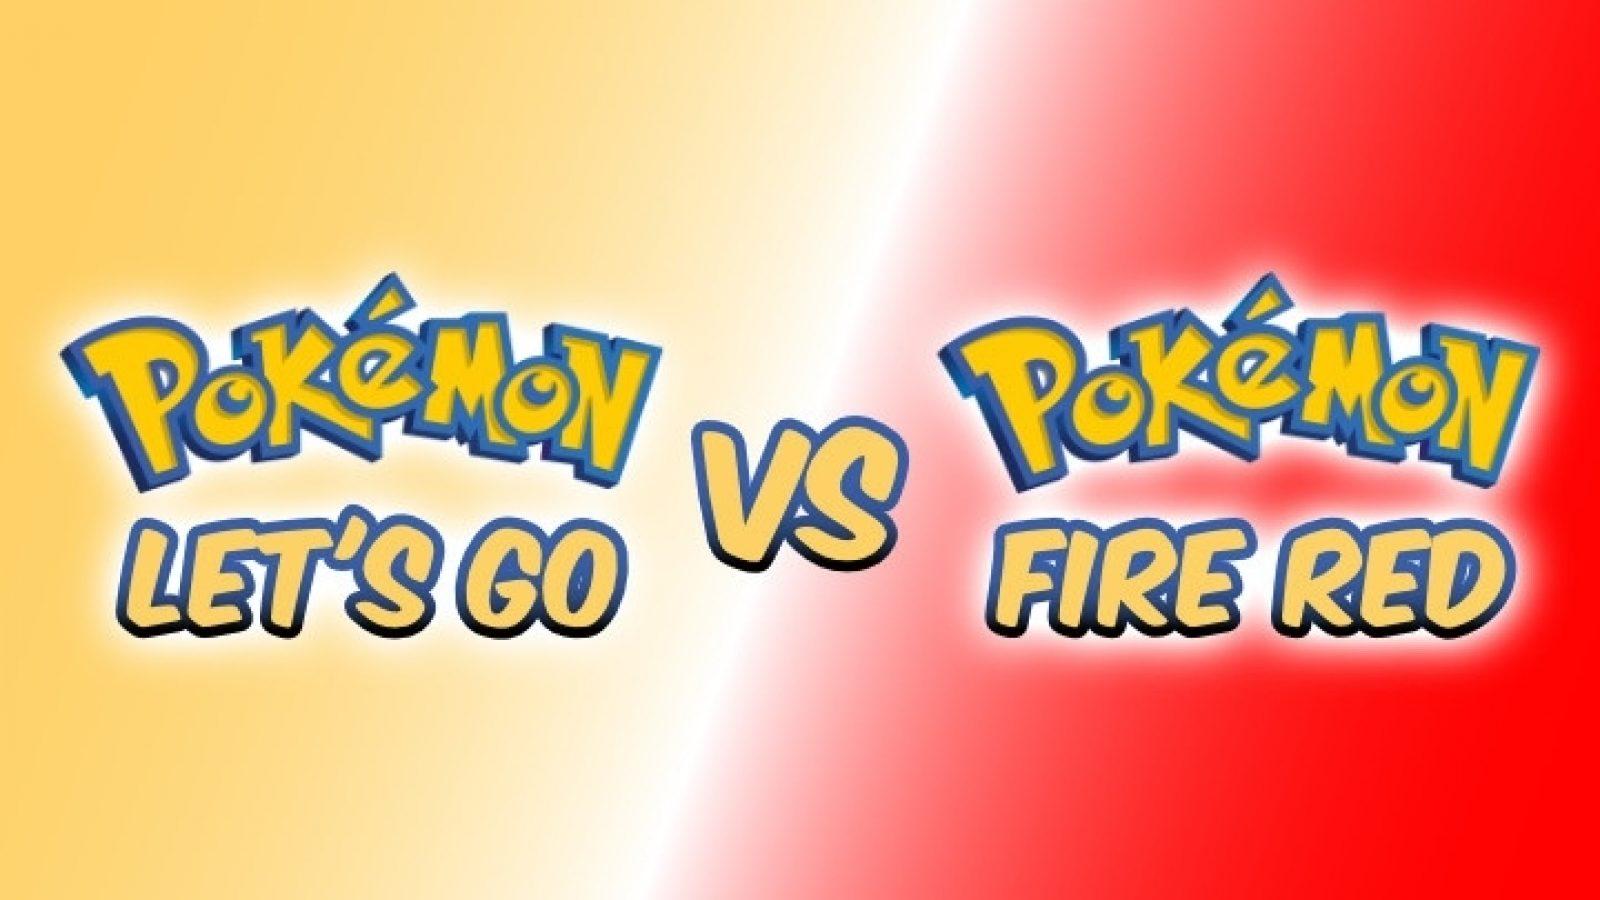 Pokemon Let S Go Vs Pokemon Fire Red Differences Dexerto